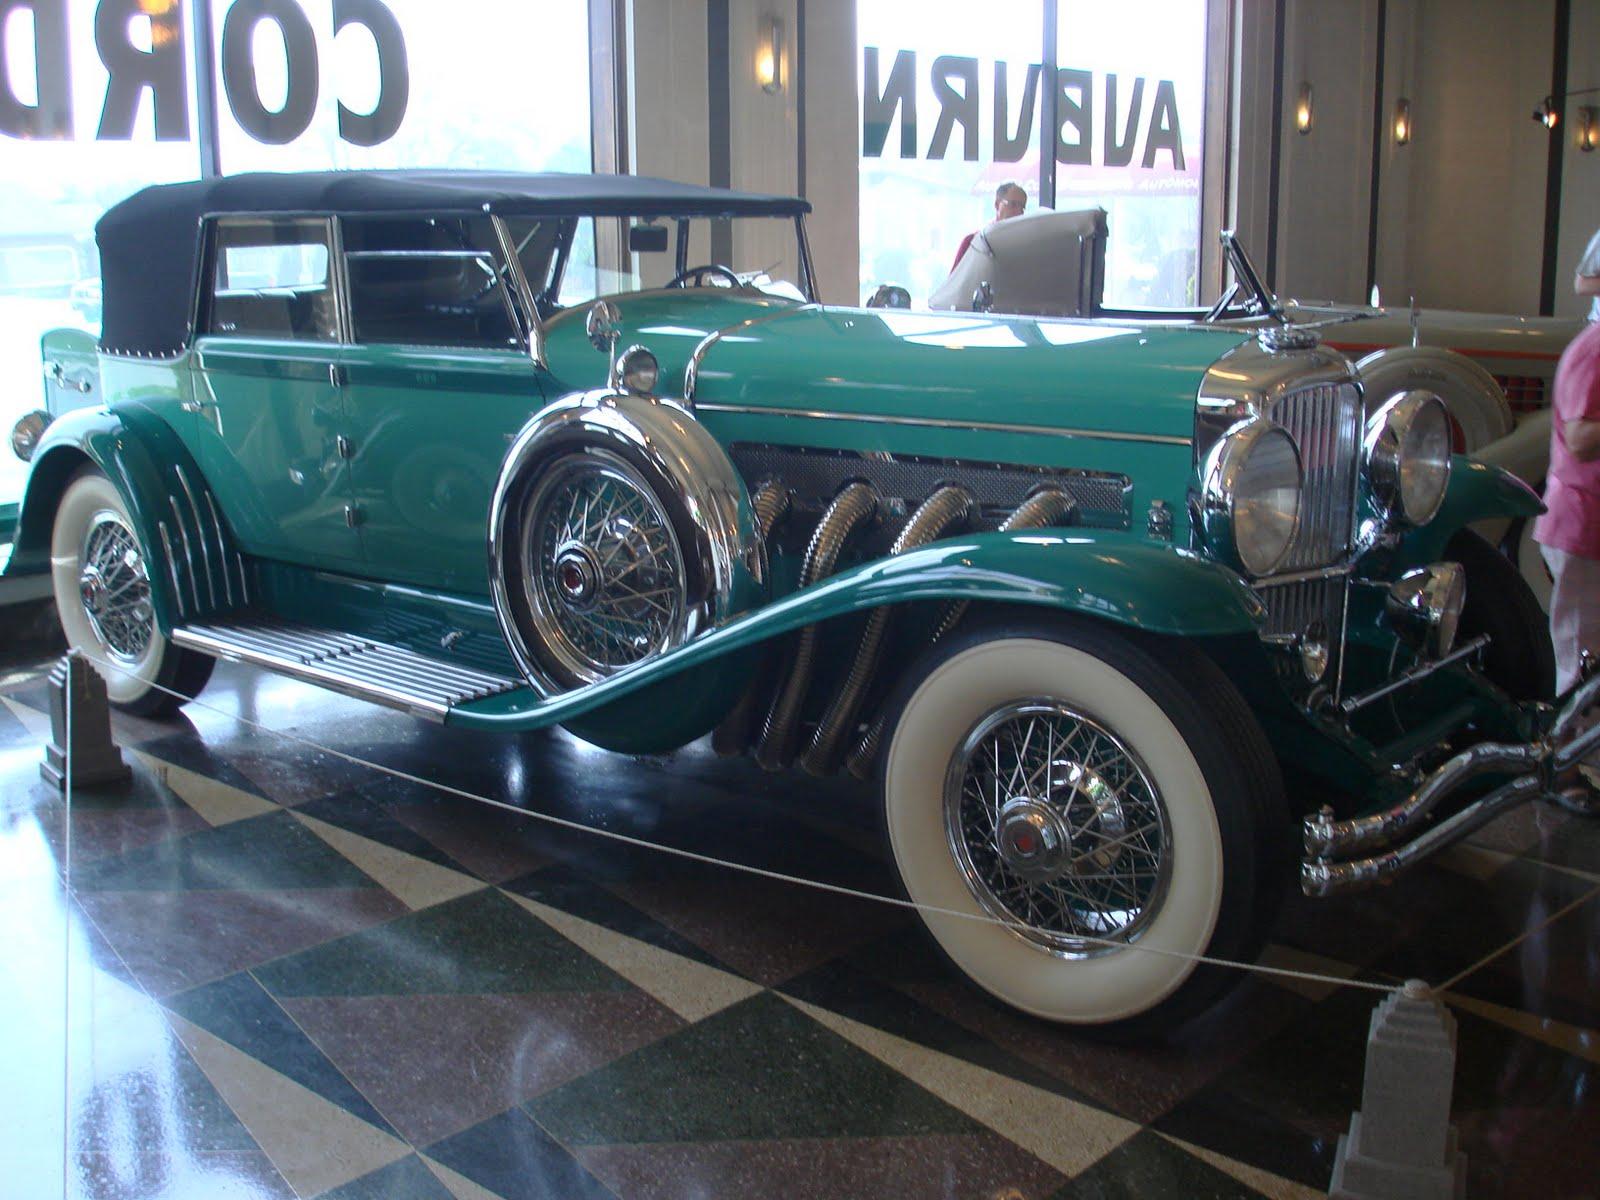 duesenberg vintage car wallpapers - photo #41